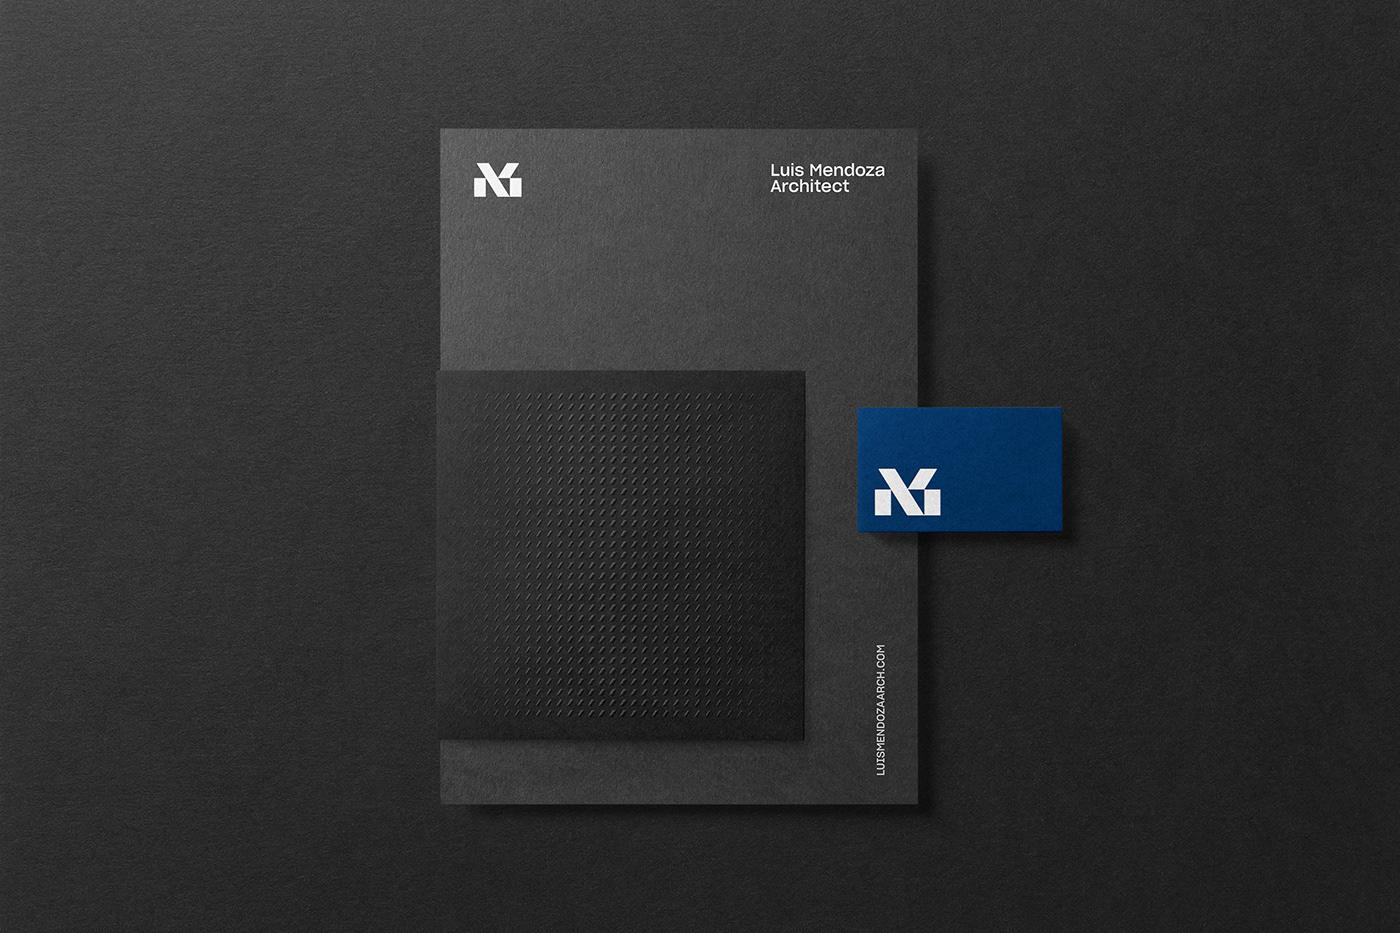 brandidentity branding  editorial editorialdesign graphicdesign logo logomark Logotype print printcollateral